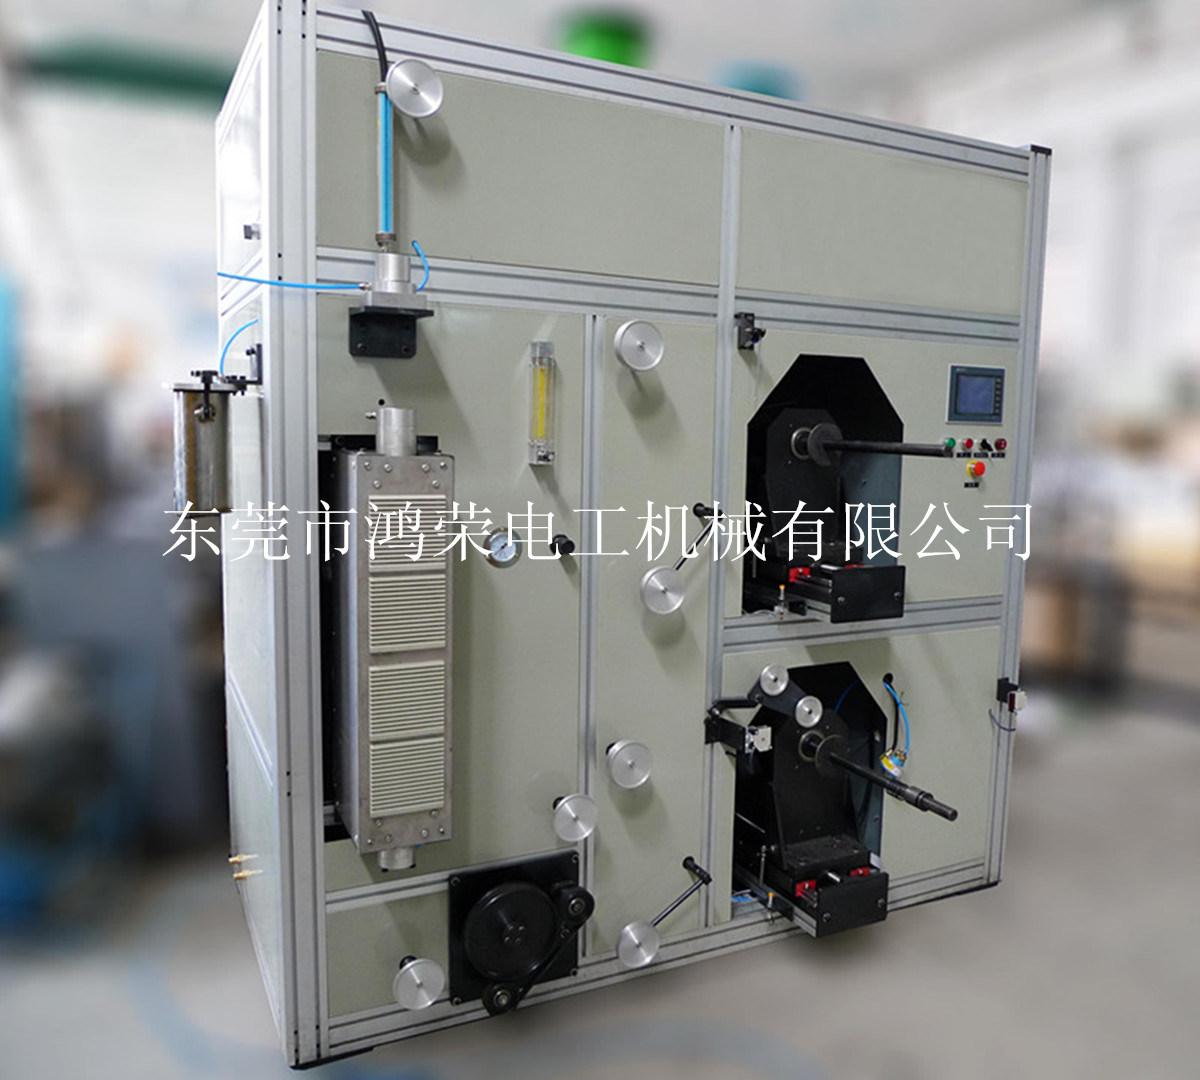 Optical Fiber Cable Equipment